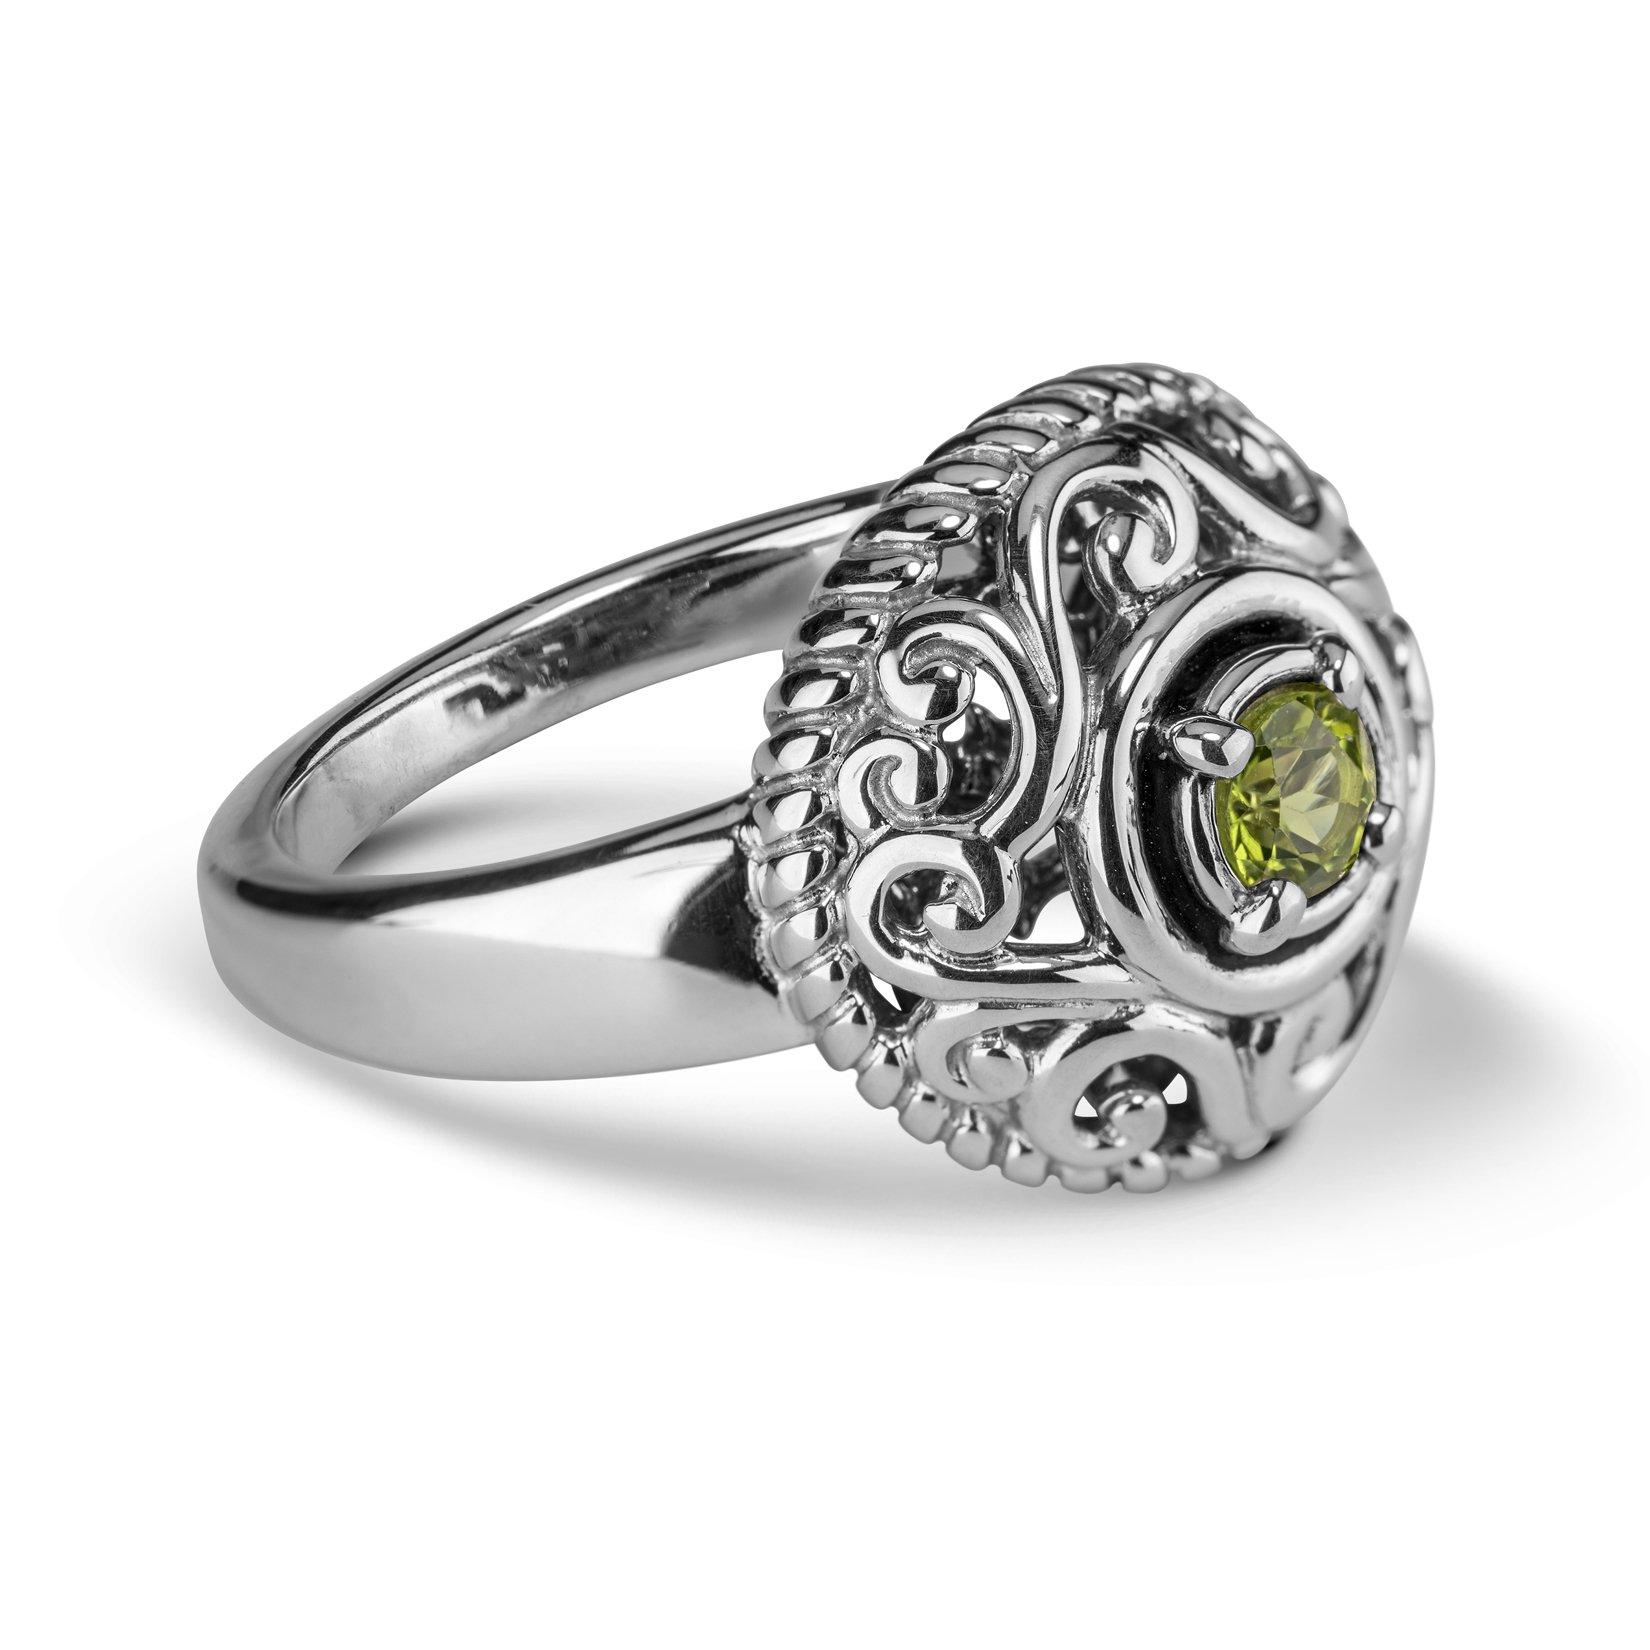 Carolyn Pollack - Sterling Silver Green Peridot Birthstone Ring - Size 8